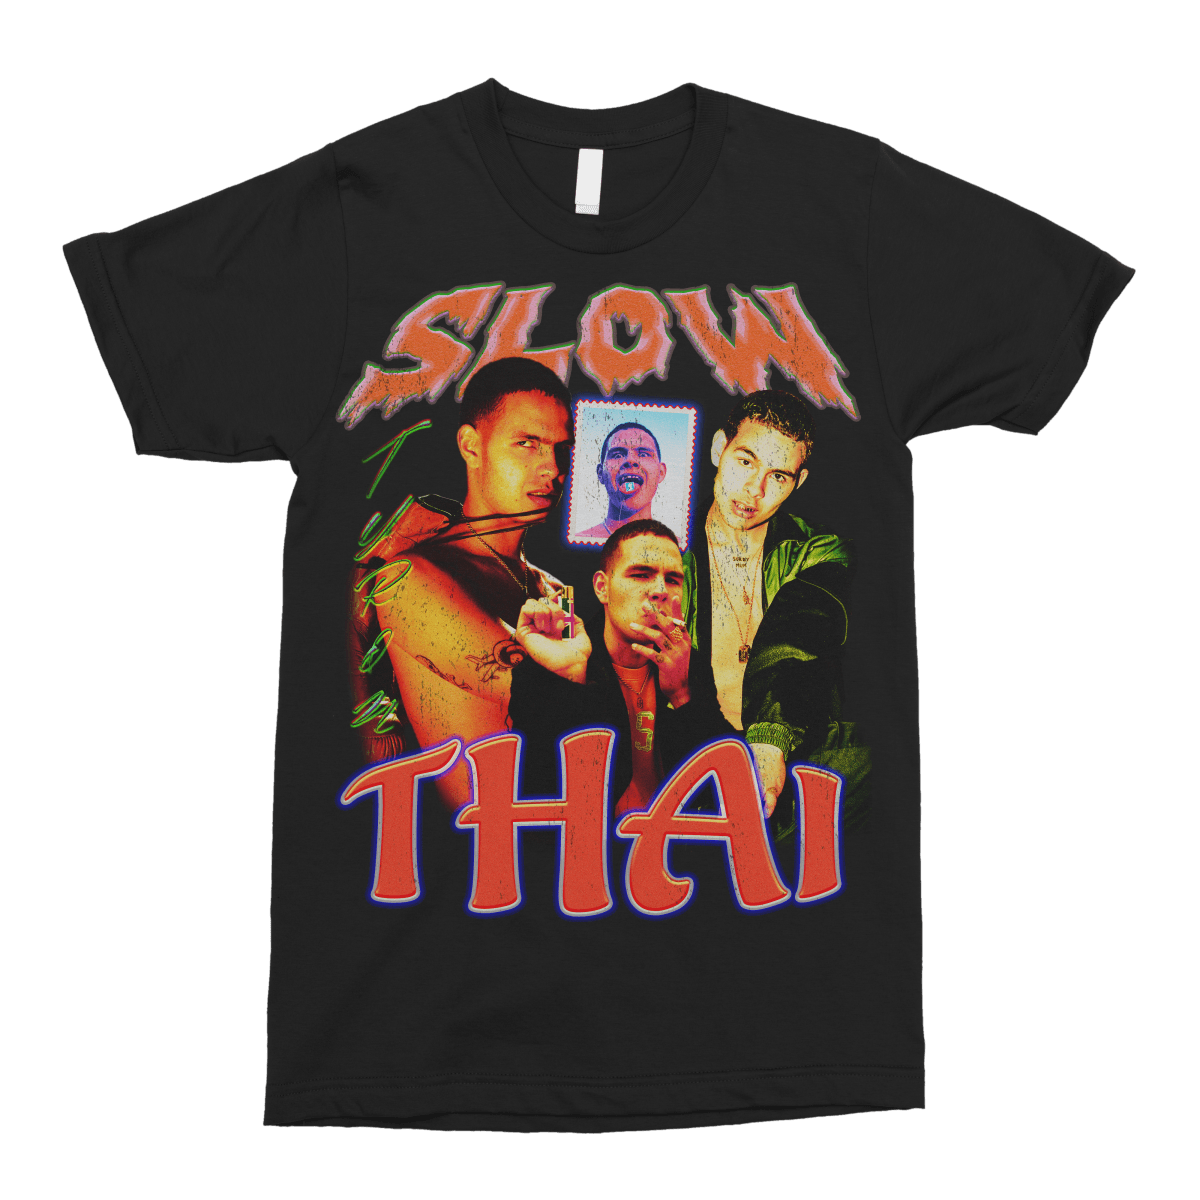 Slowthai Vintage Bootleg Unisex T-Shirt